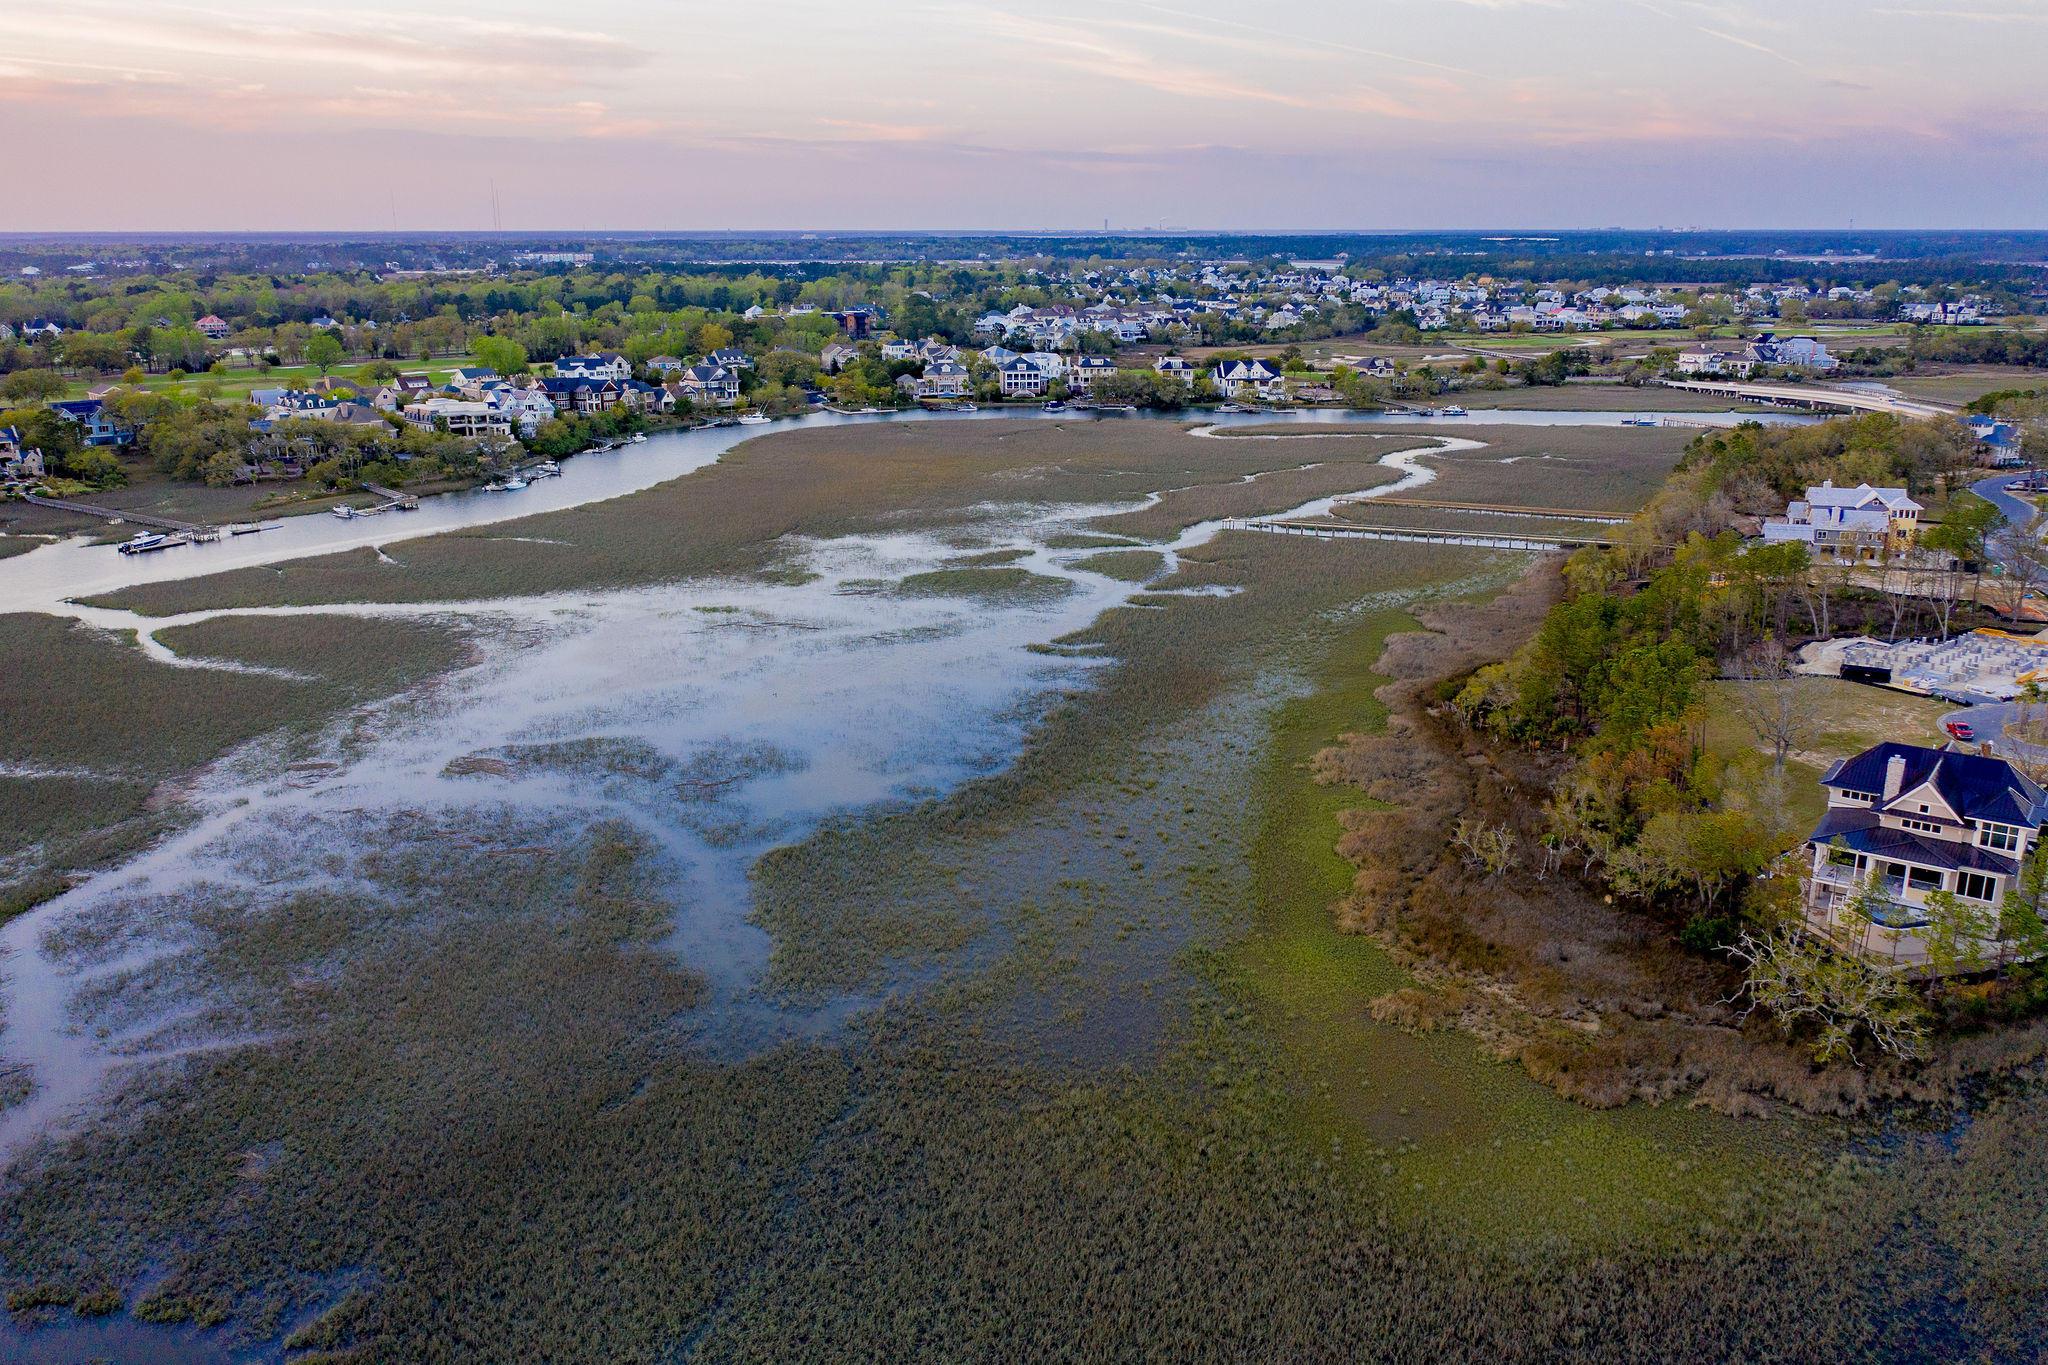 Daniel Island Park Homes For Sale - 113 Captains Island, Charleston, SC - 3